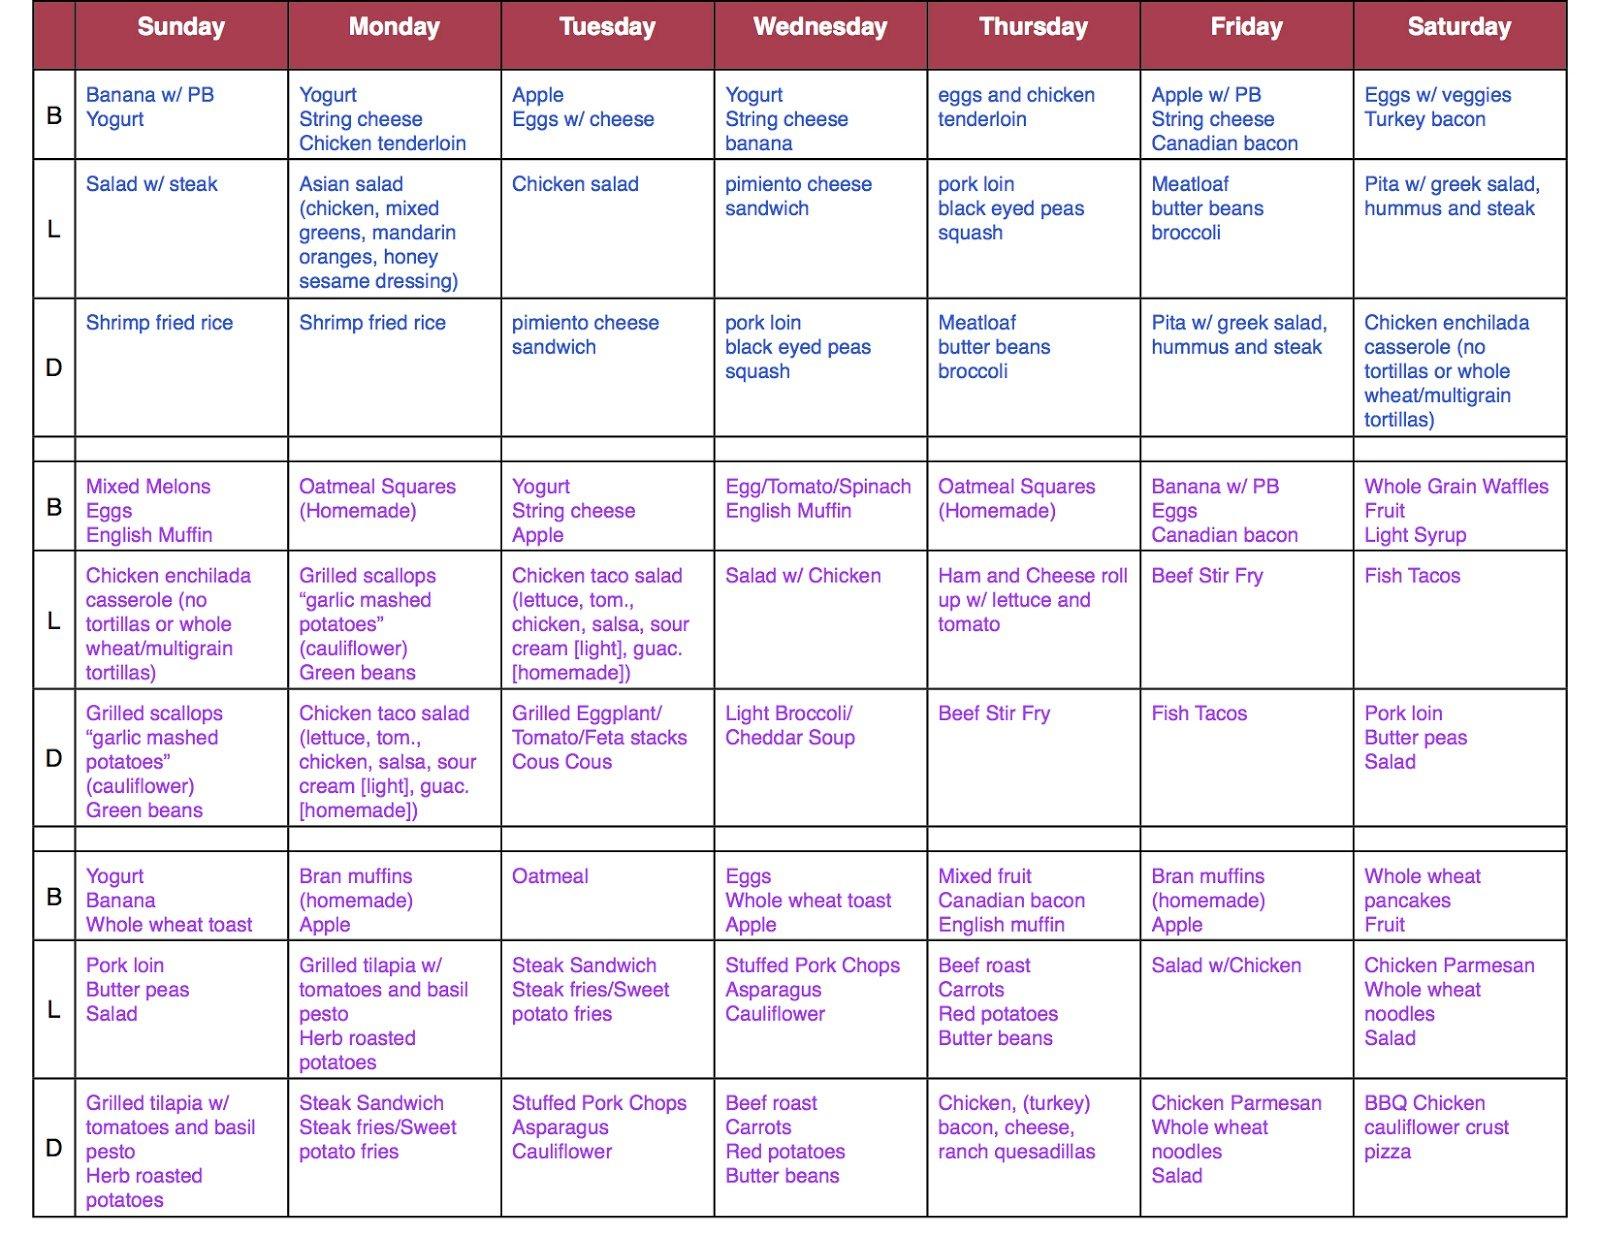 qwlc diet plan pdf